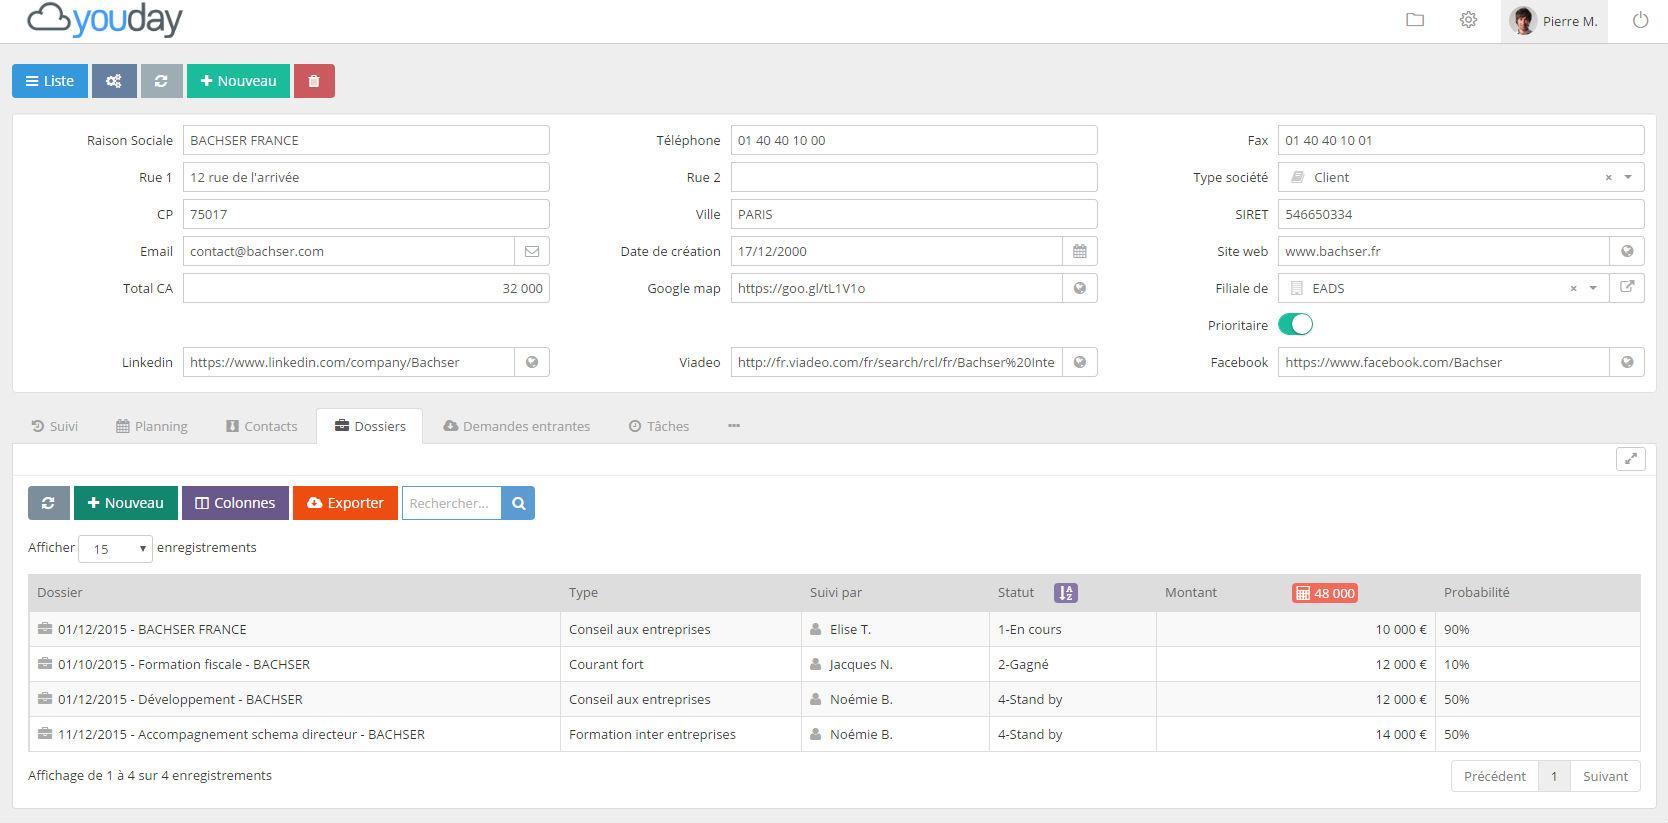 Youday CRM : gestion de comptes